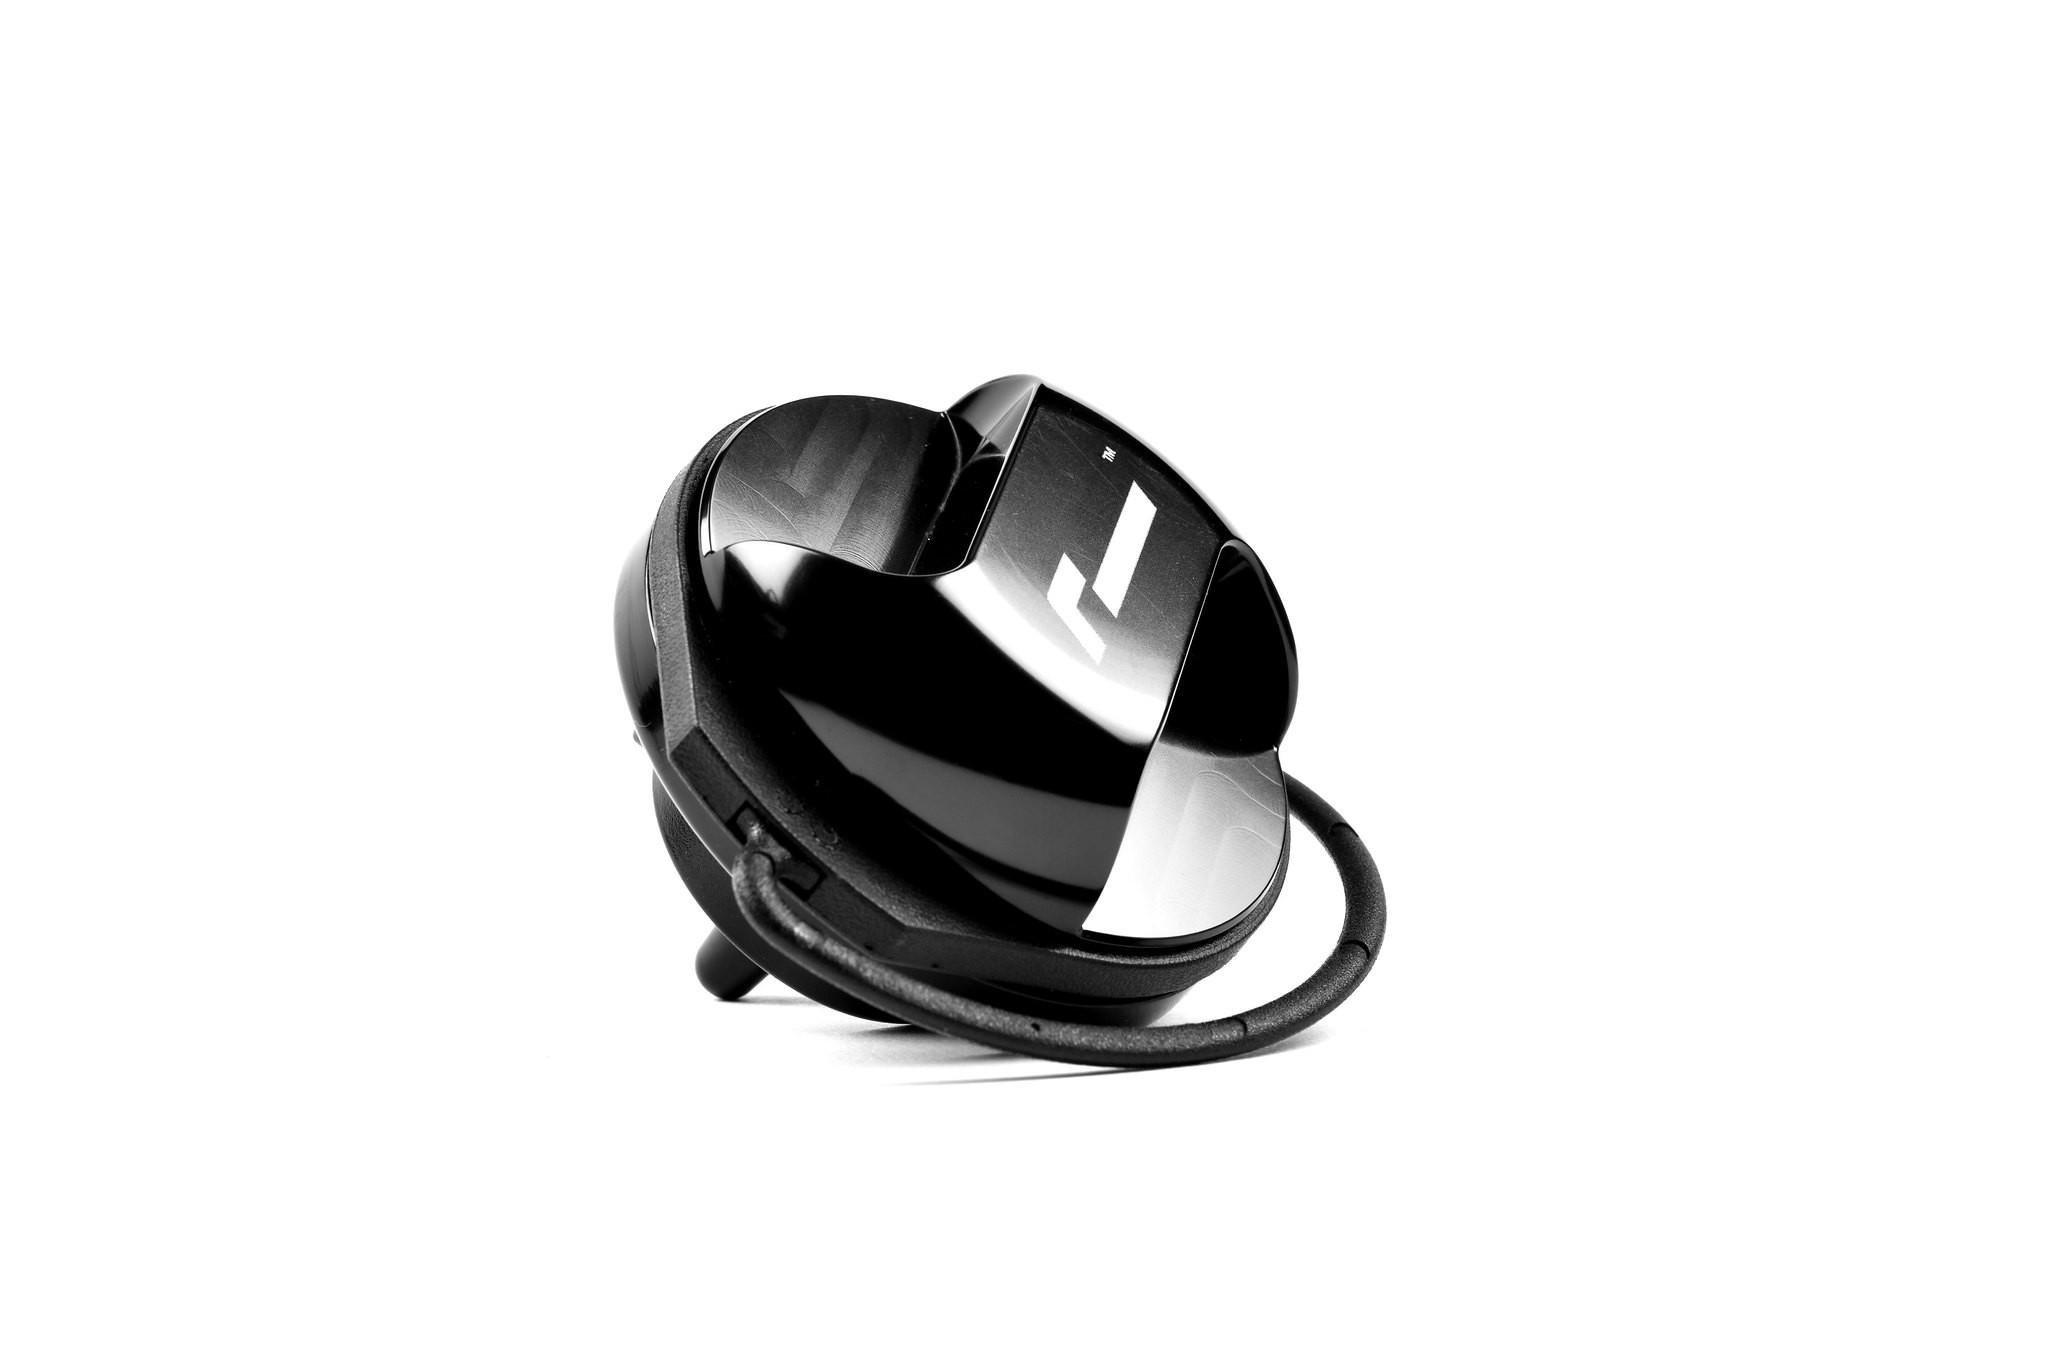 RacingLine Billet Fuel Filler Cap | VWR19G711